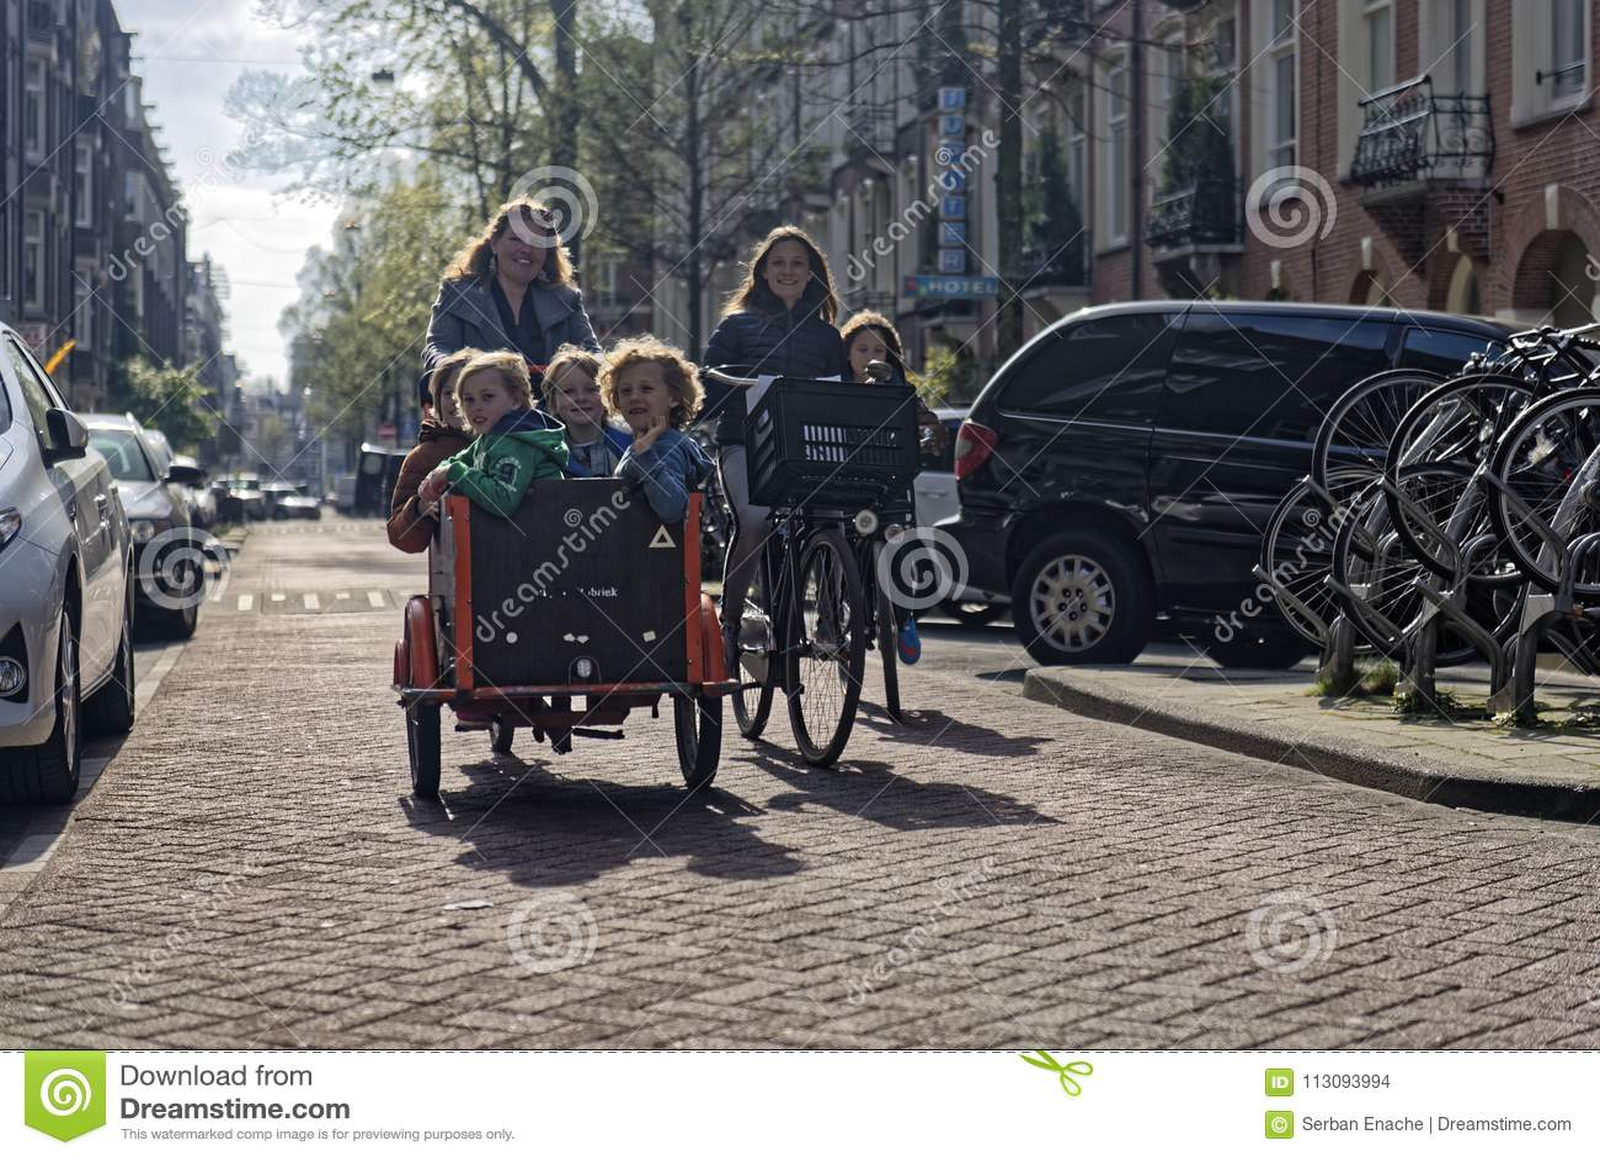 Rodziny na rowerach, Amsterdam, Holandia